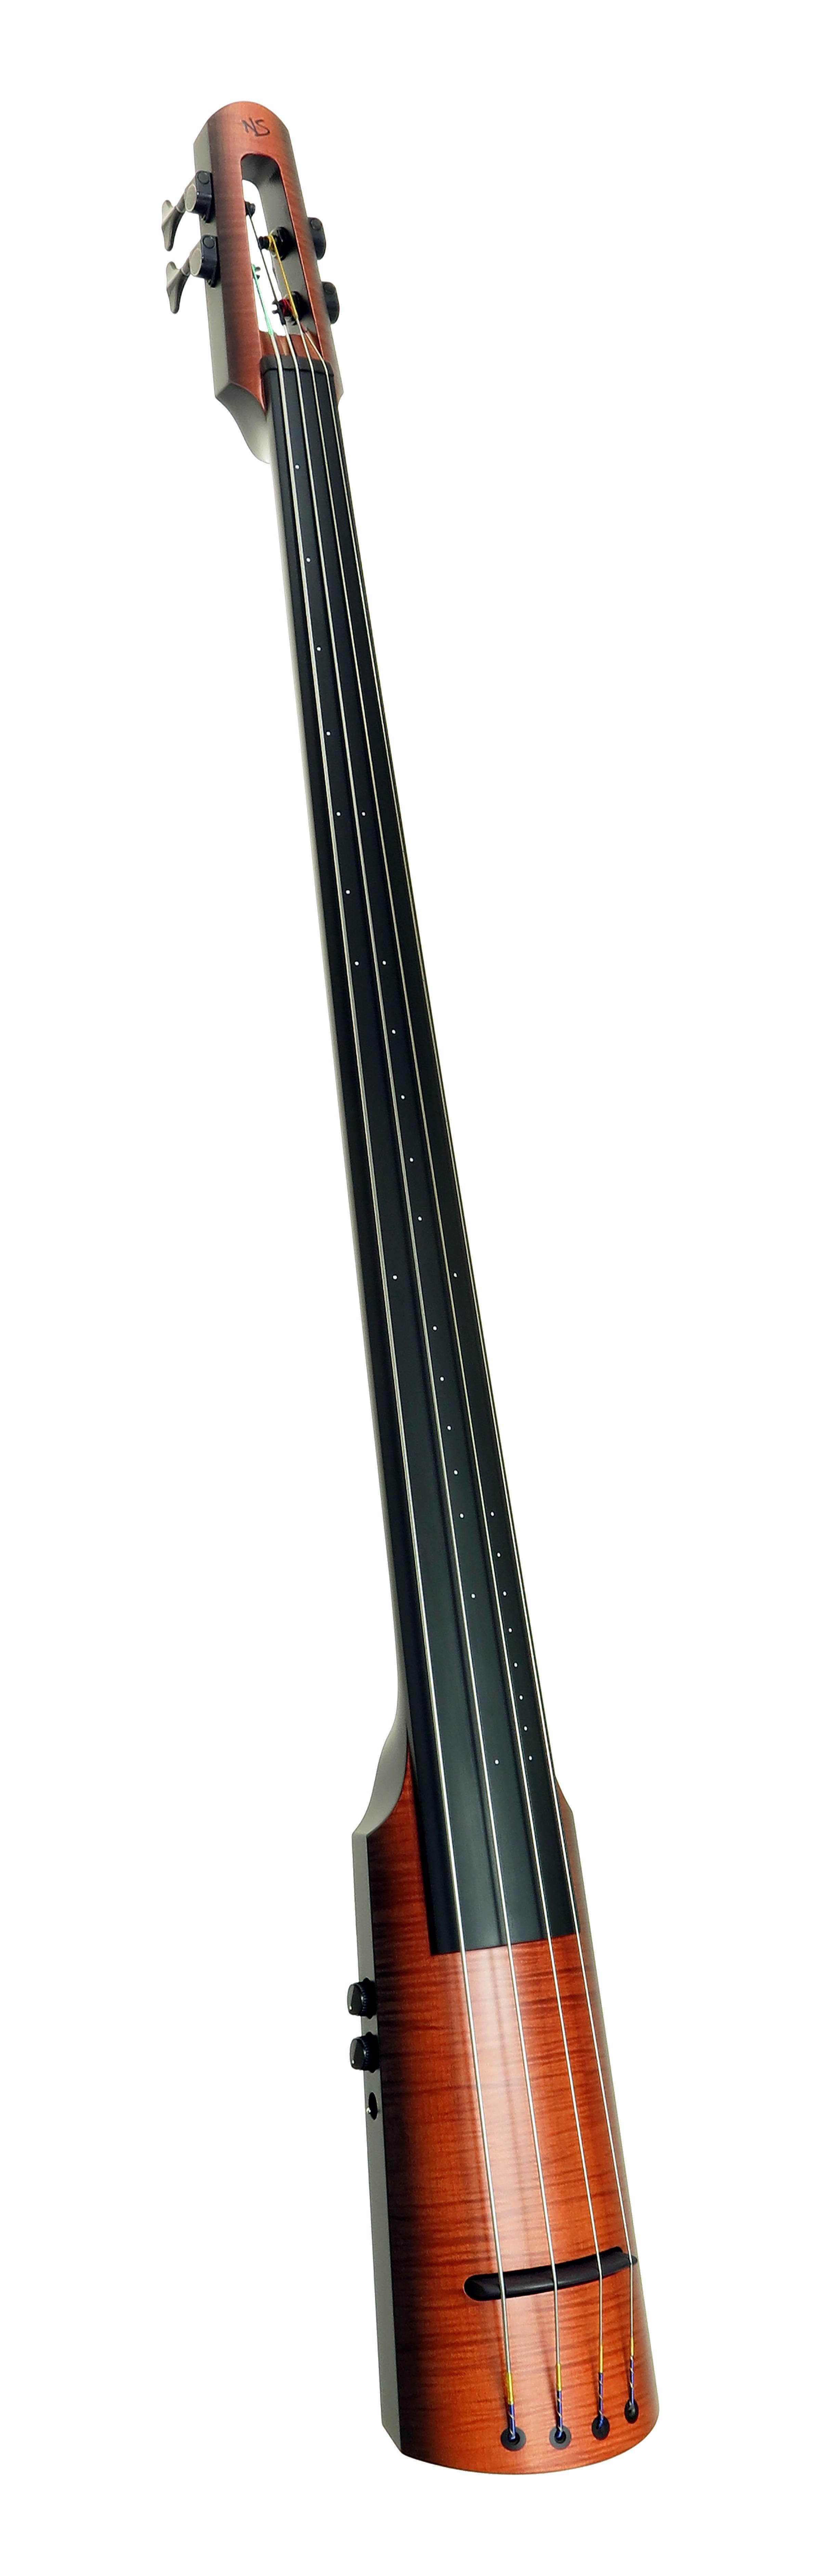 ns design nxt 4 string electric double bass sunburst musical instruments